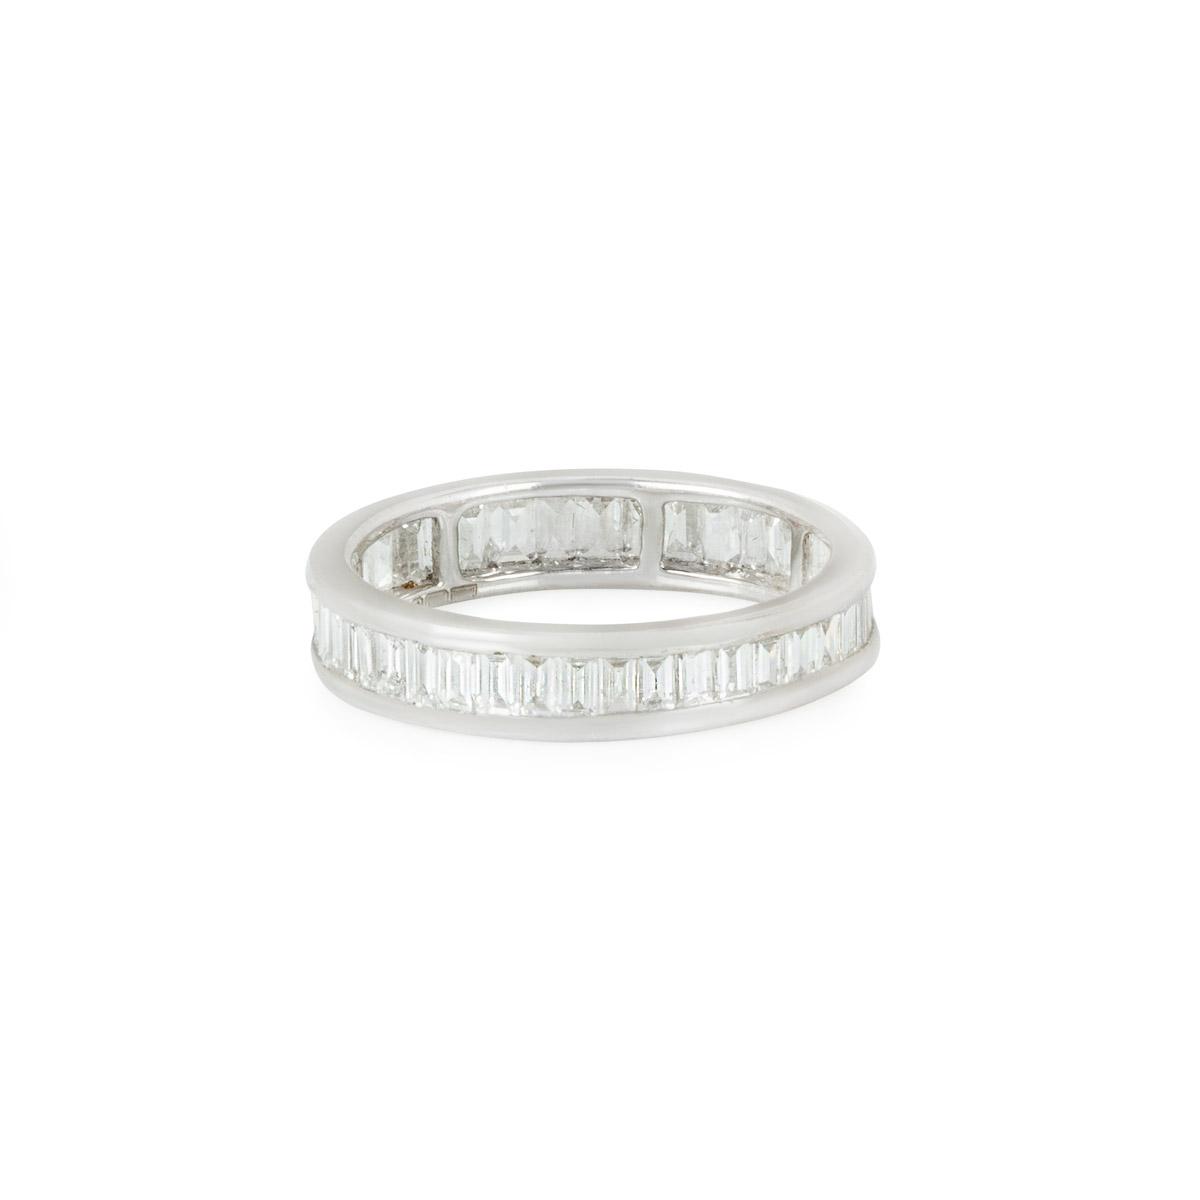 White Gold Baguette Cut Diamond Eternity Ring